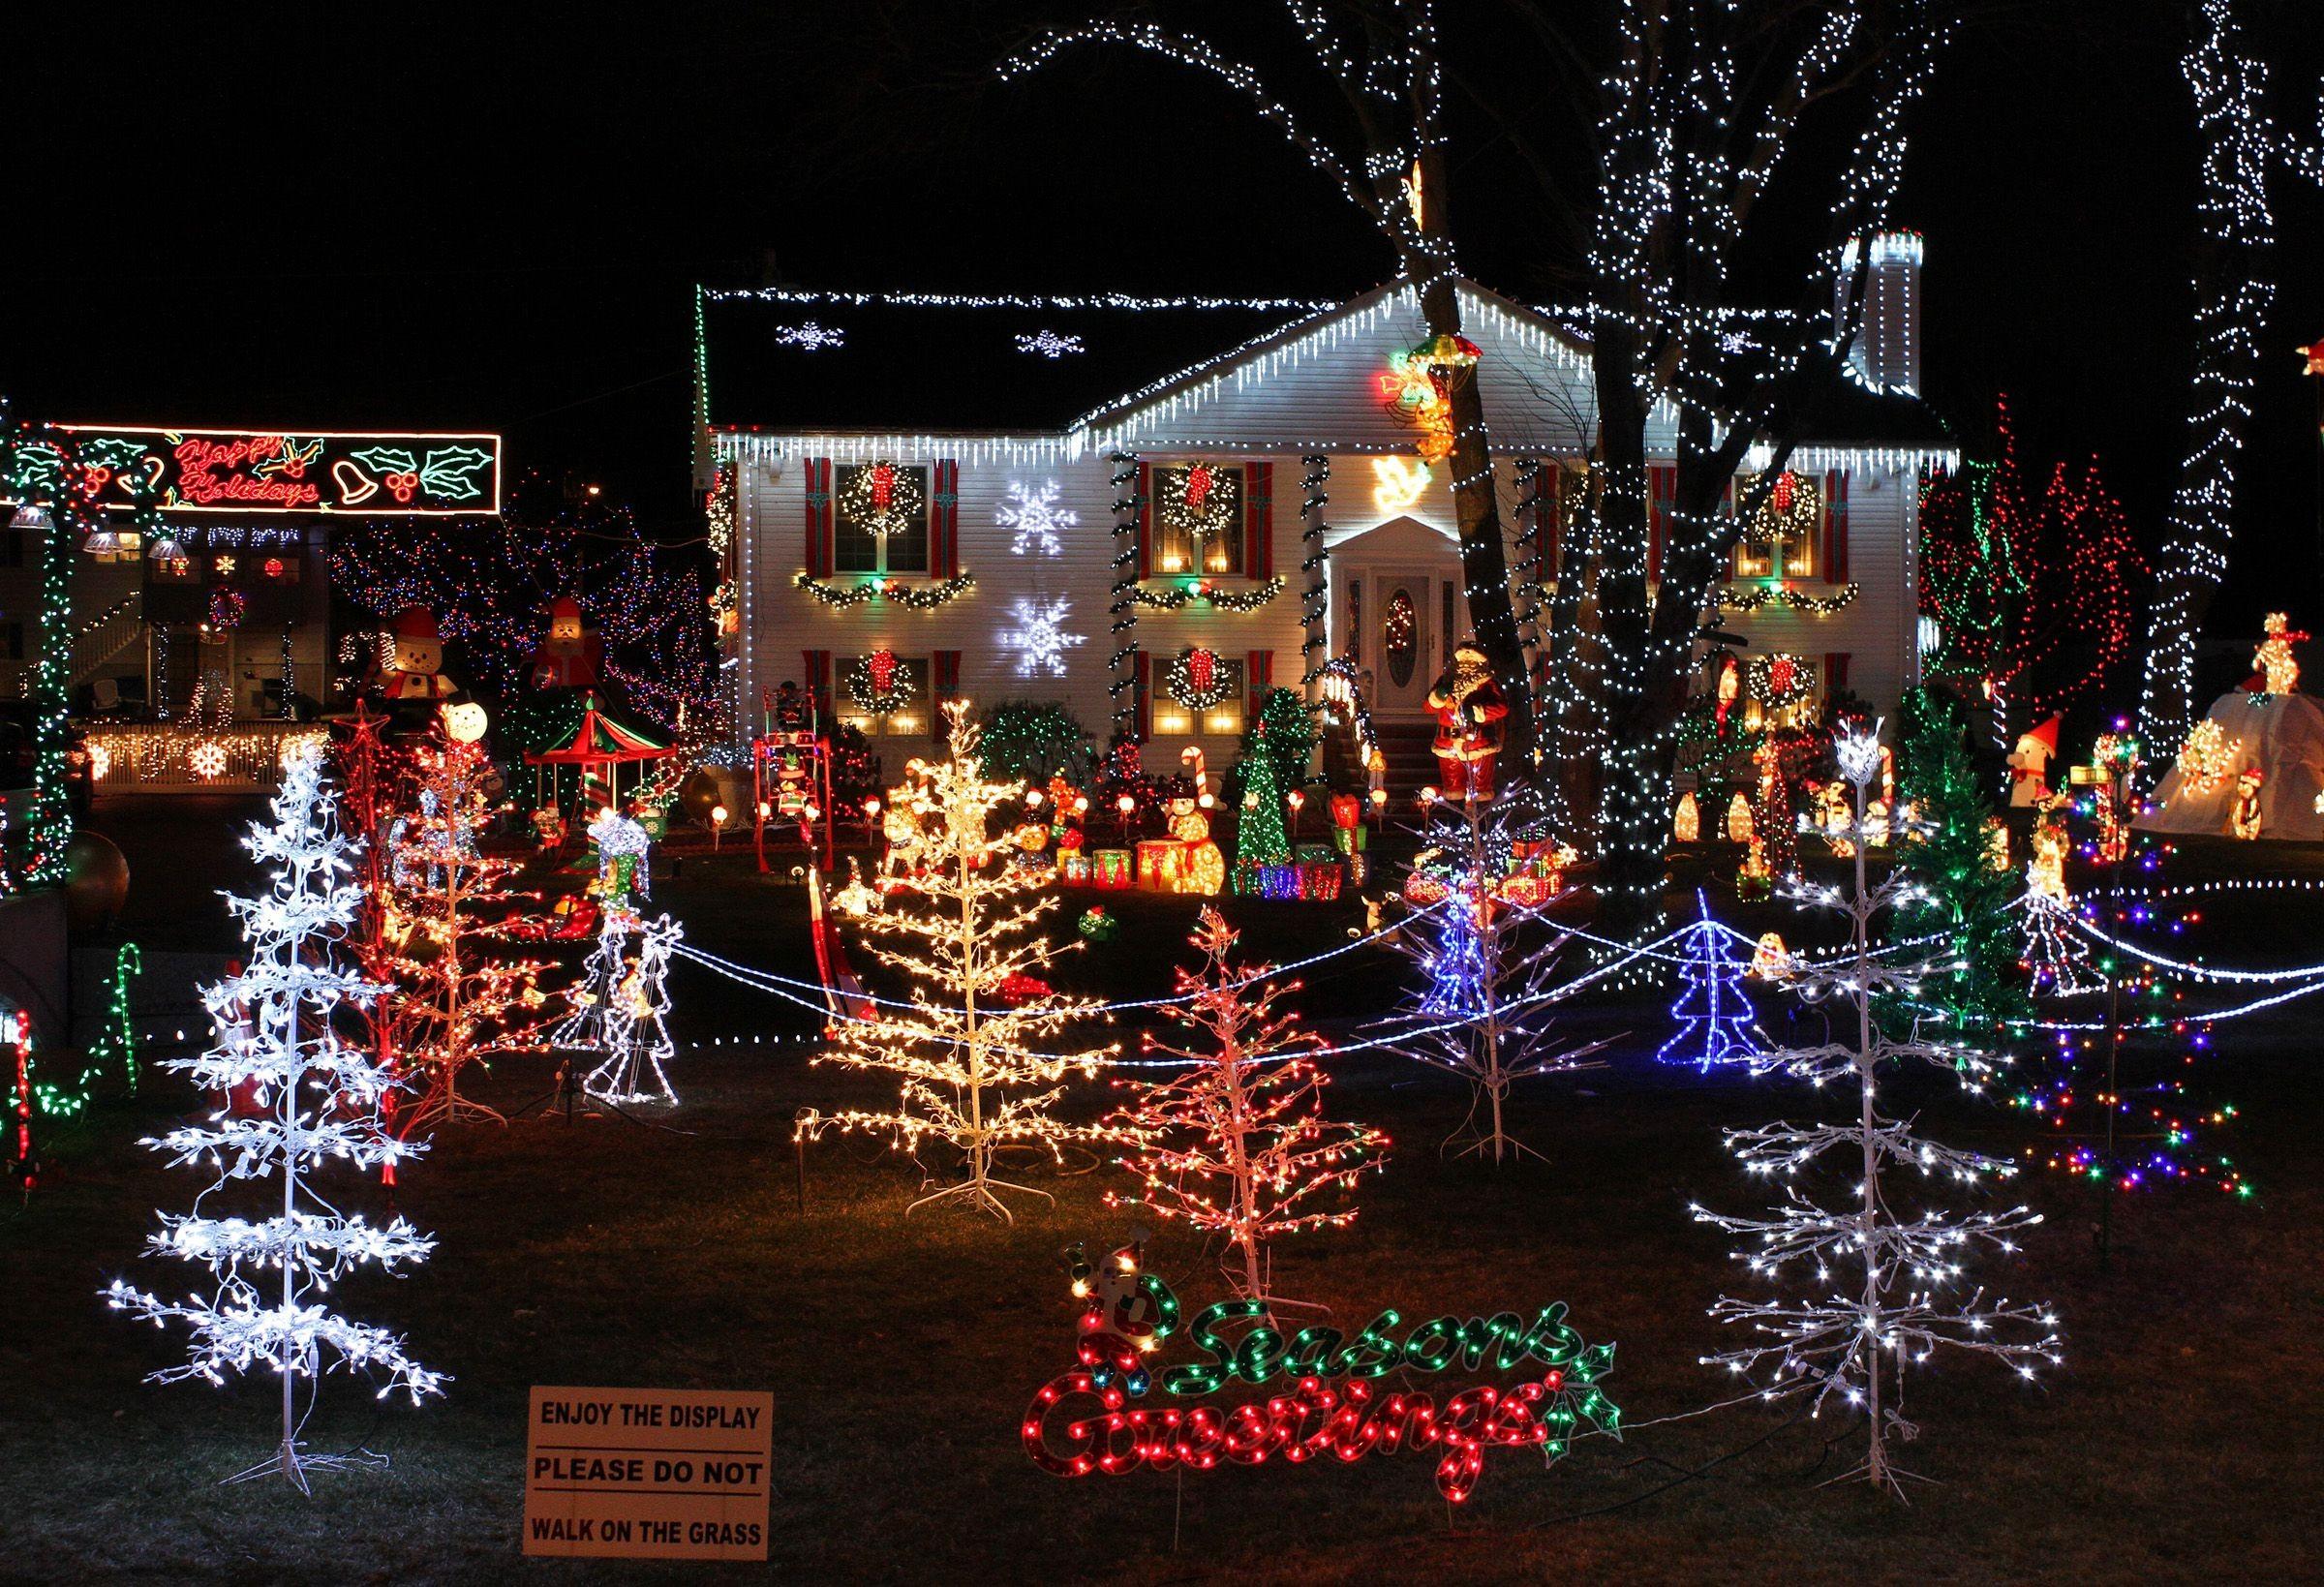 Christmas Lights house display 5893edf13df78caebc JPG